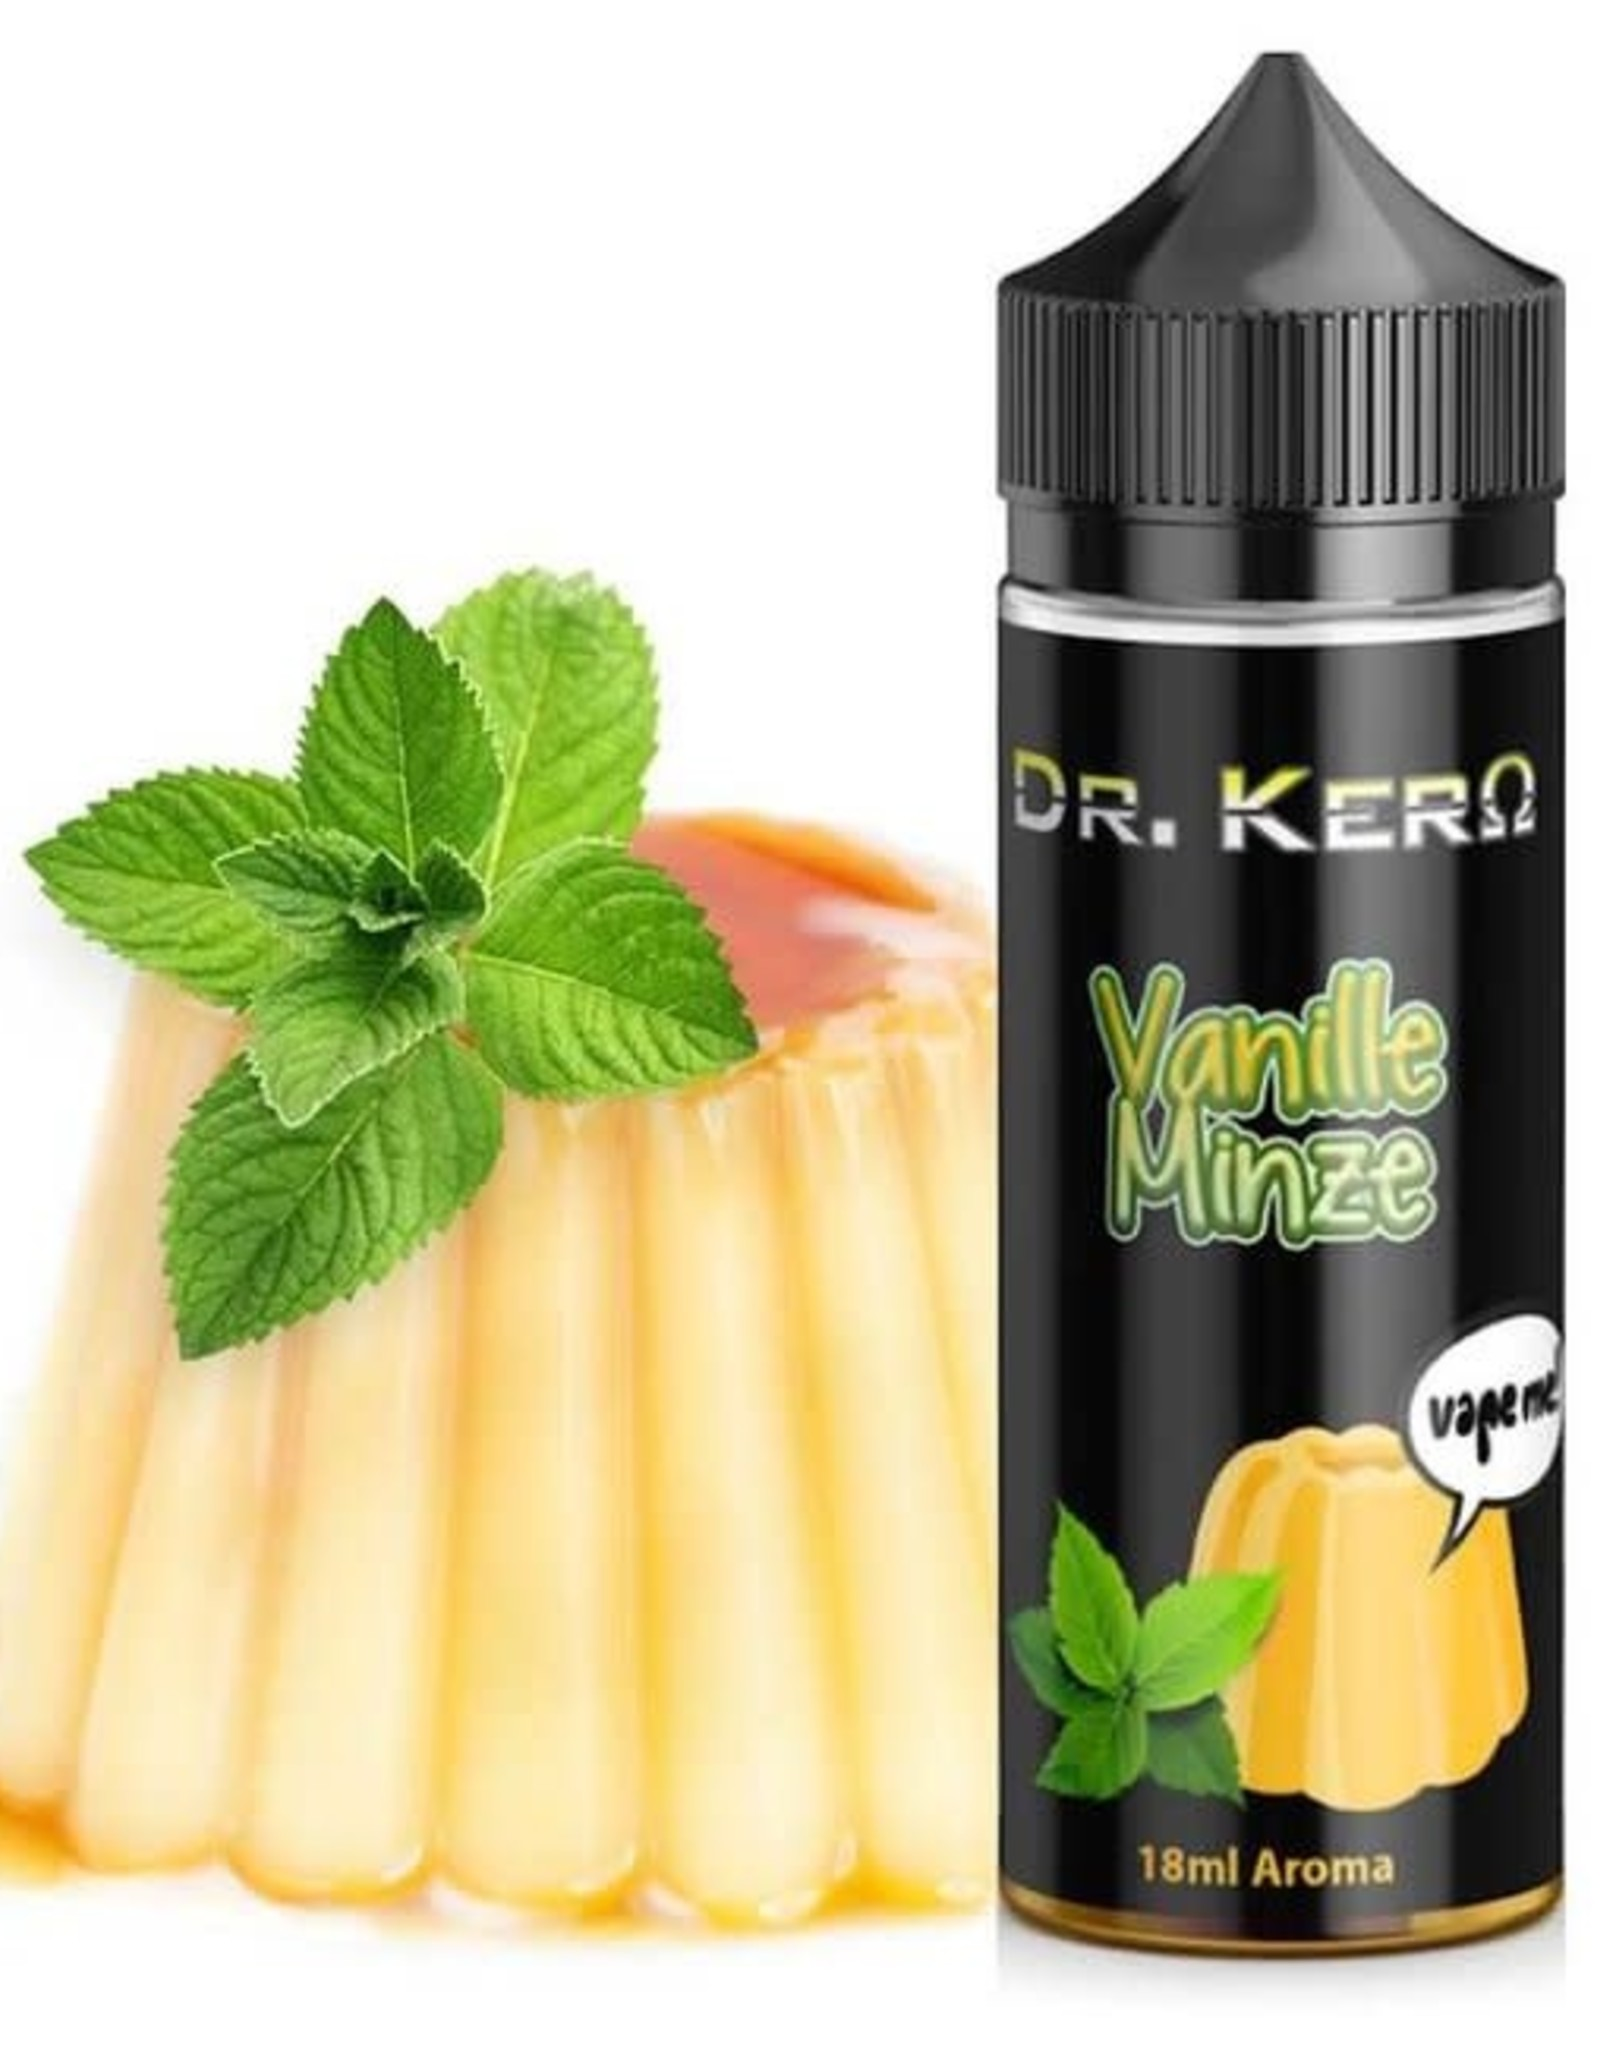 Dr. Kero Dr. Kero - Vanille Minze 18ml